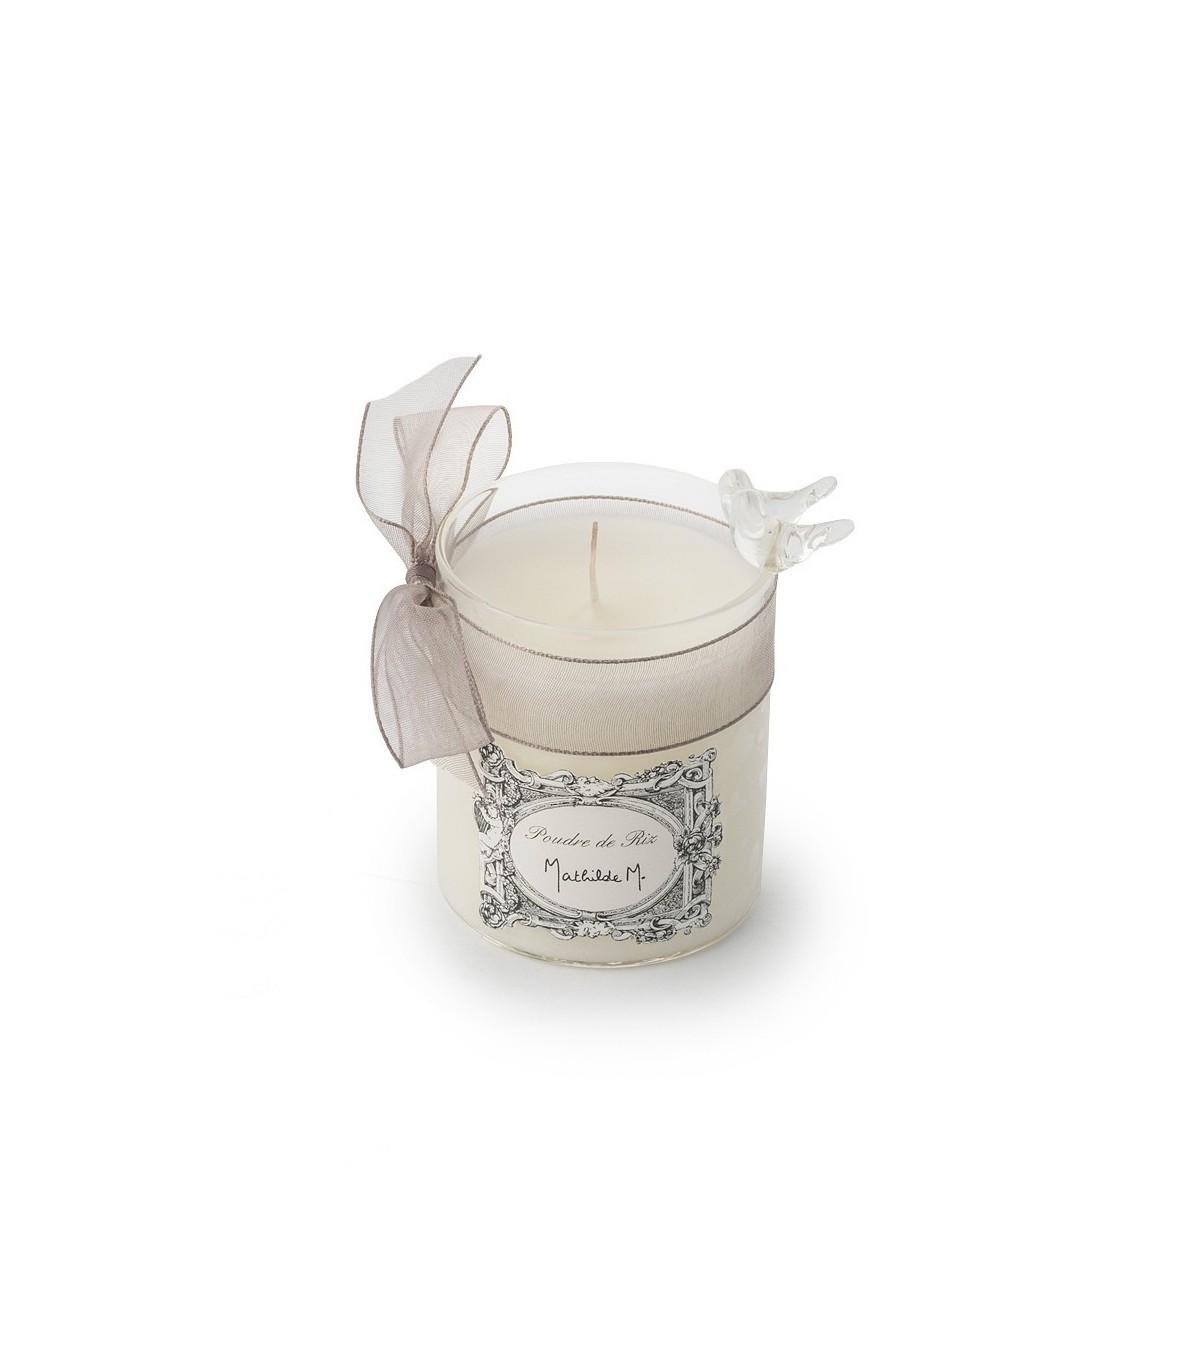 scented candle mathilde m poudre de riz. Black Bedroom Furniture Sets. Home Design Ideas